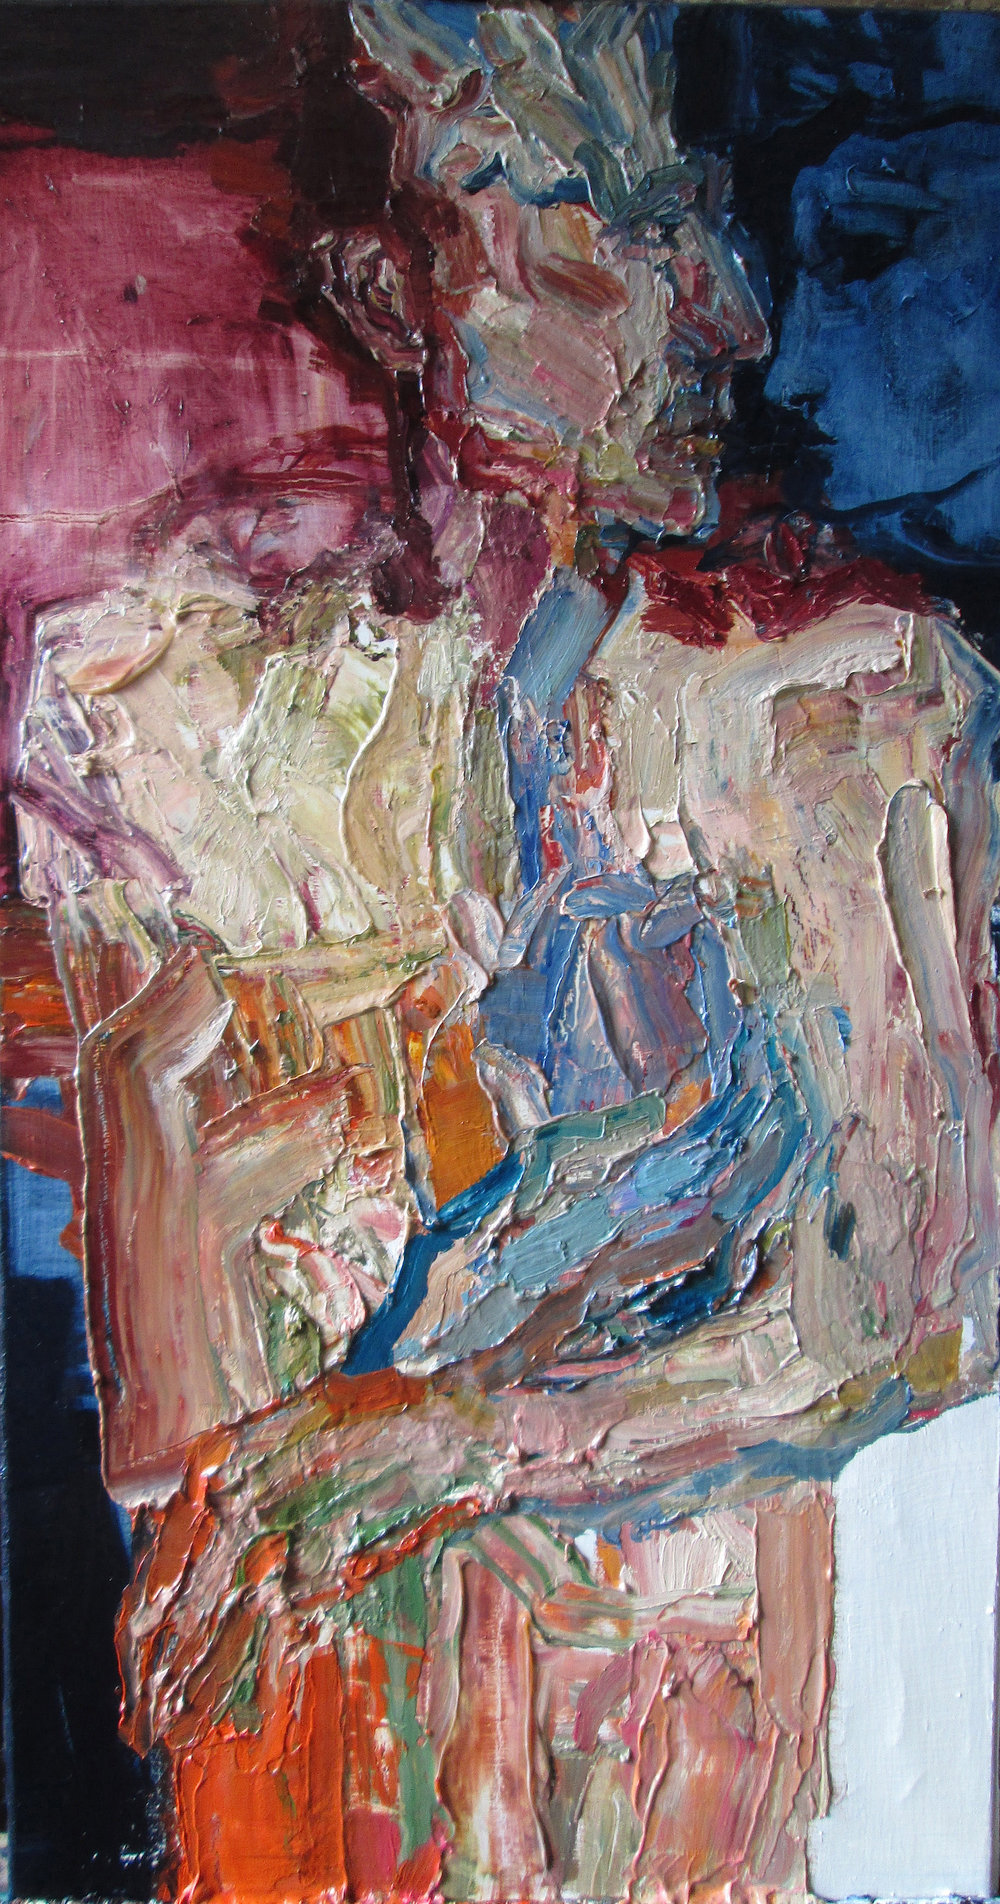 Title: Mazarine Blue  Size: 90 x 53 cm  Medium: Oil on linen  Price: £1800